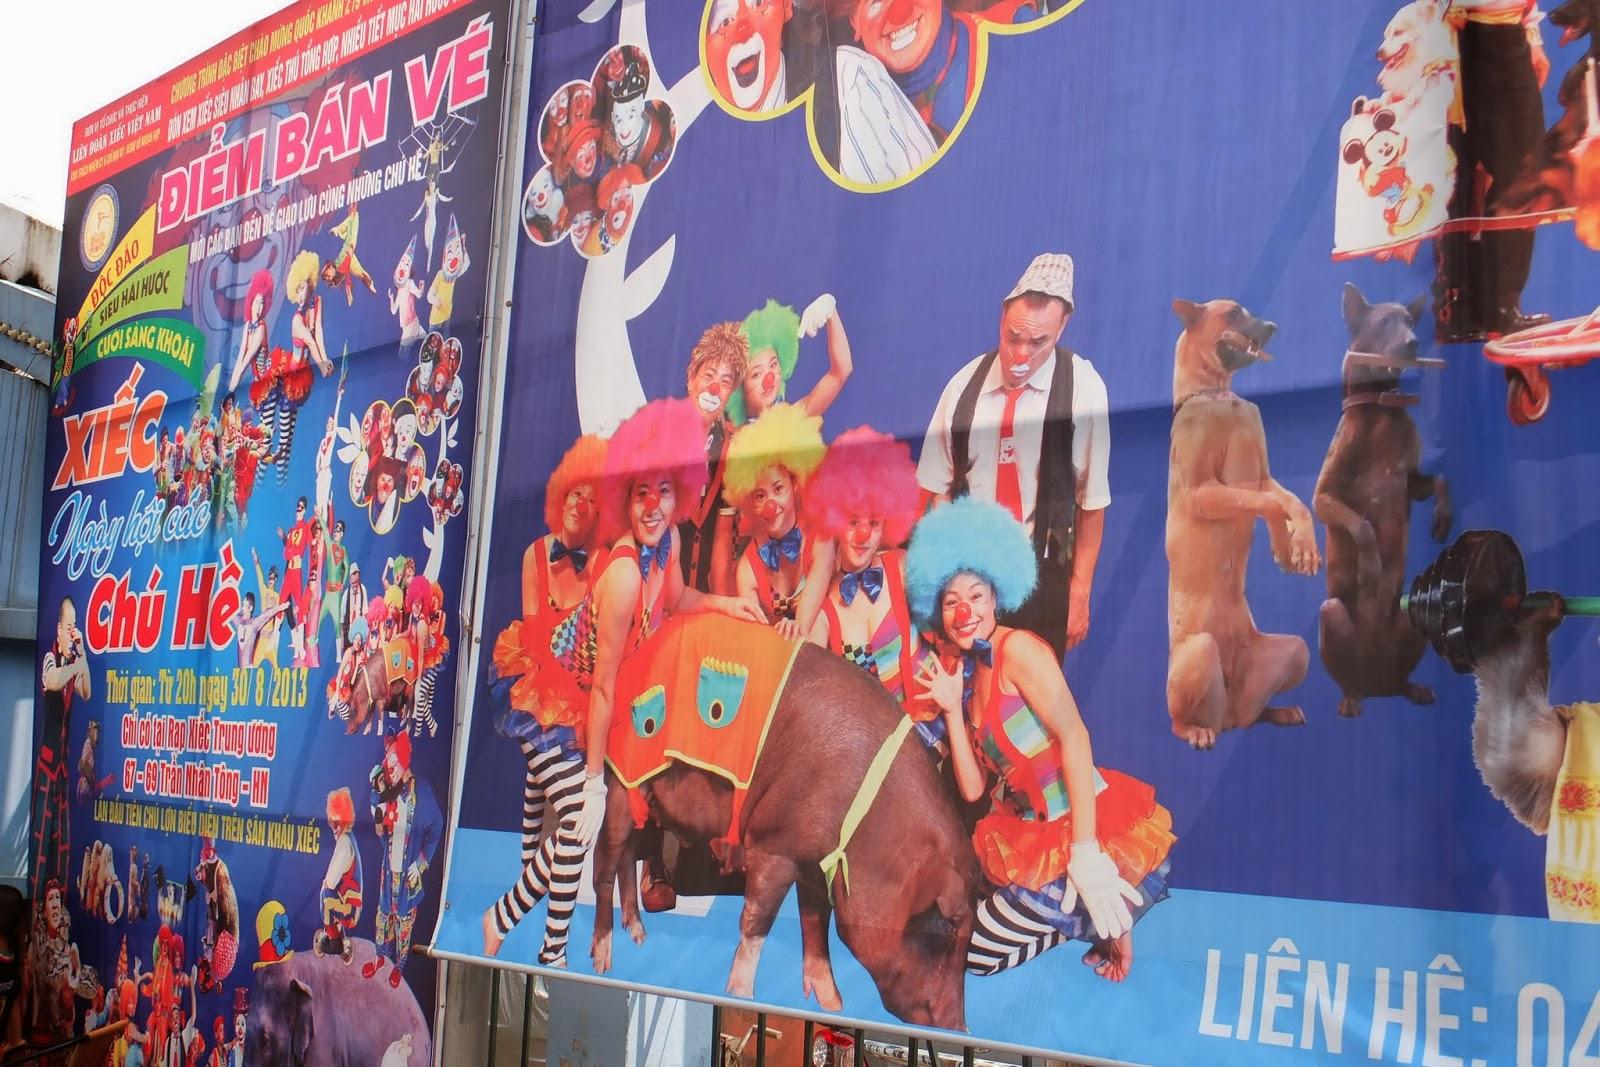 hanoi-circus-ad ハノイサーカス広告:ピエロ